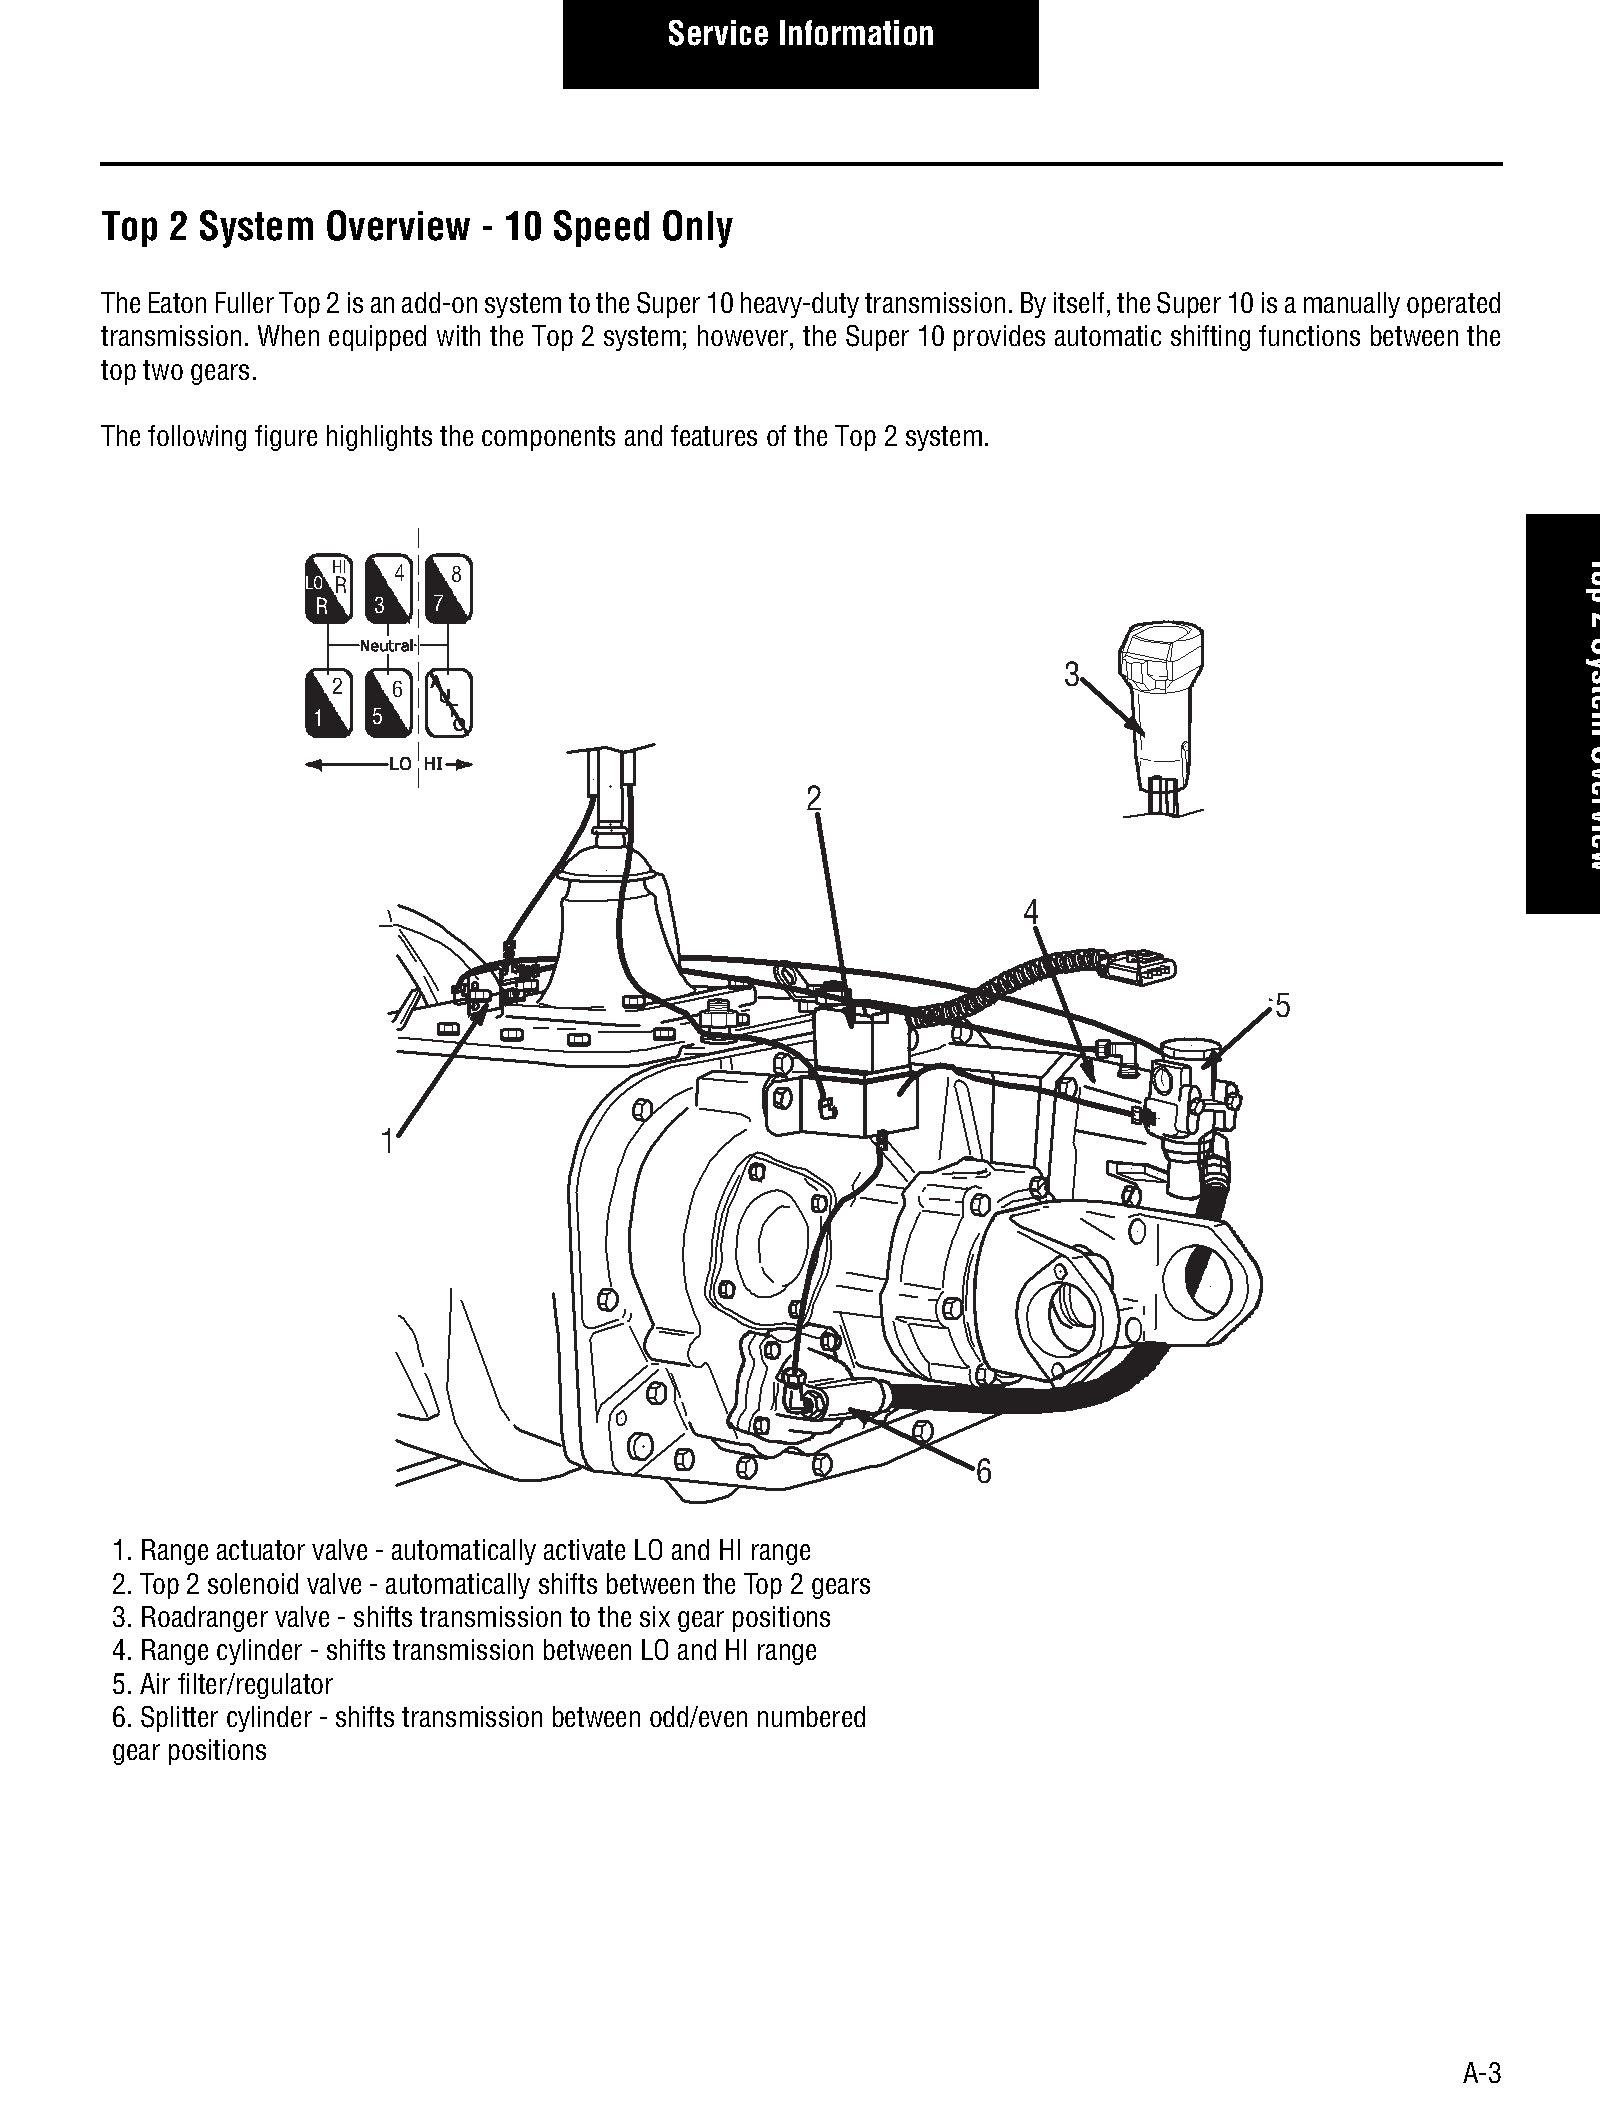 29 13 Speed Air Line Diagram